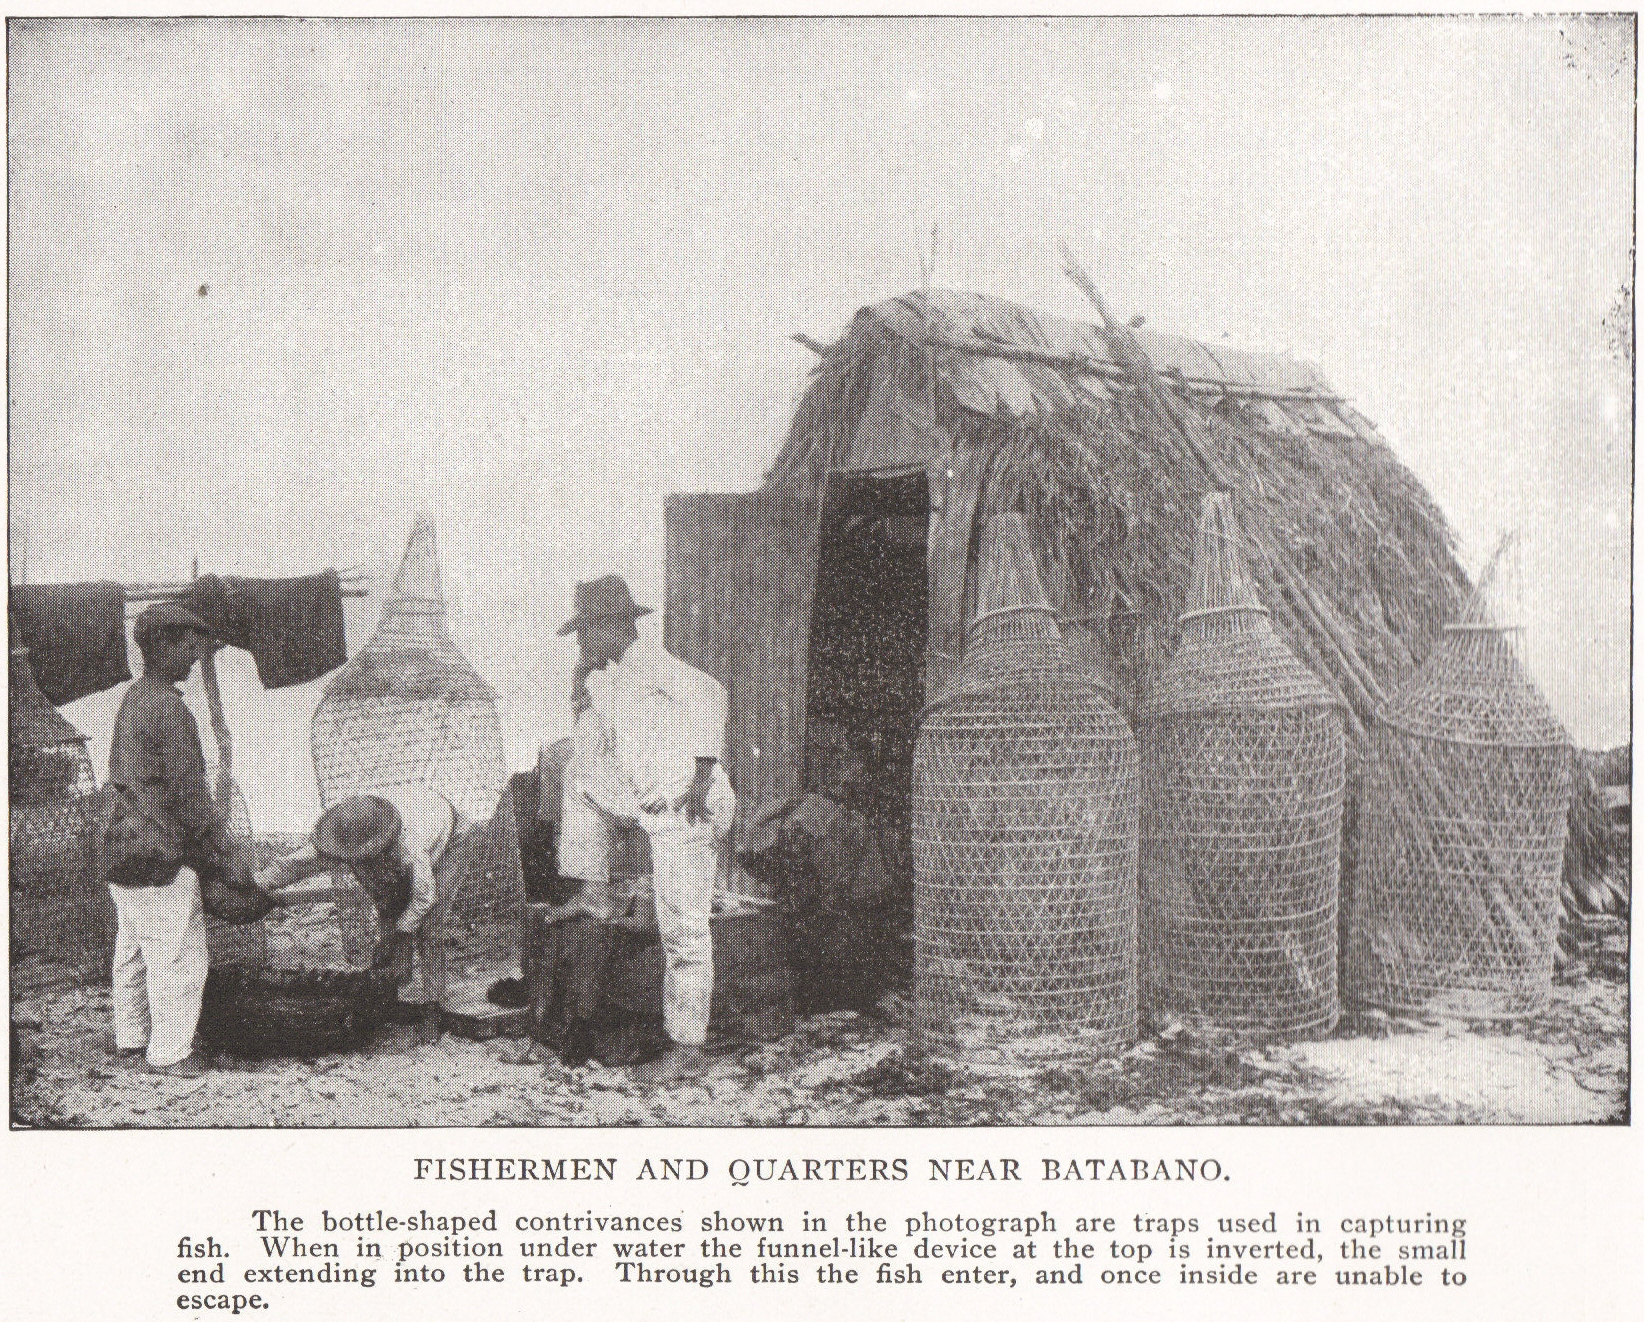 FISHERMEN AND QUARTERS NEAR BATABANO, CUBA (1898)